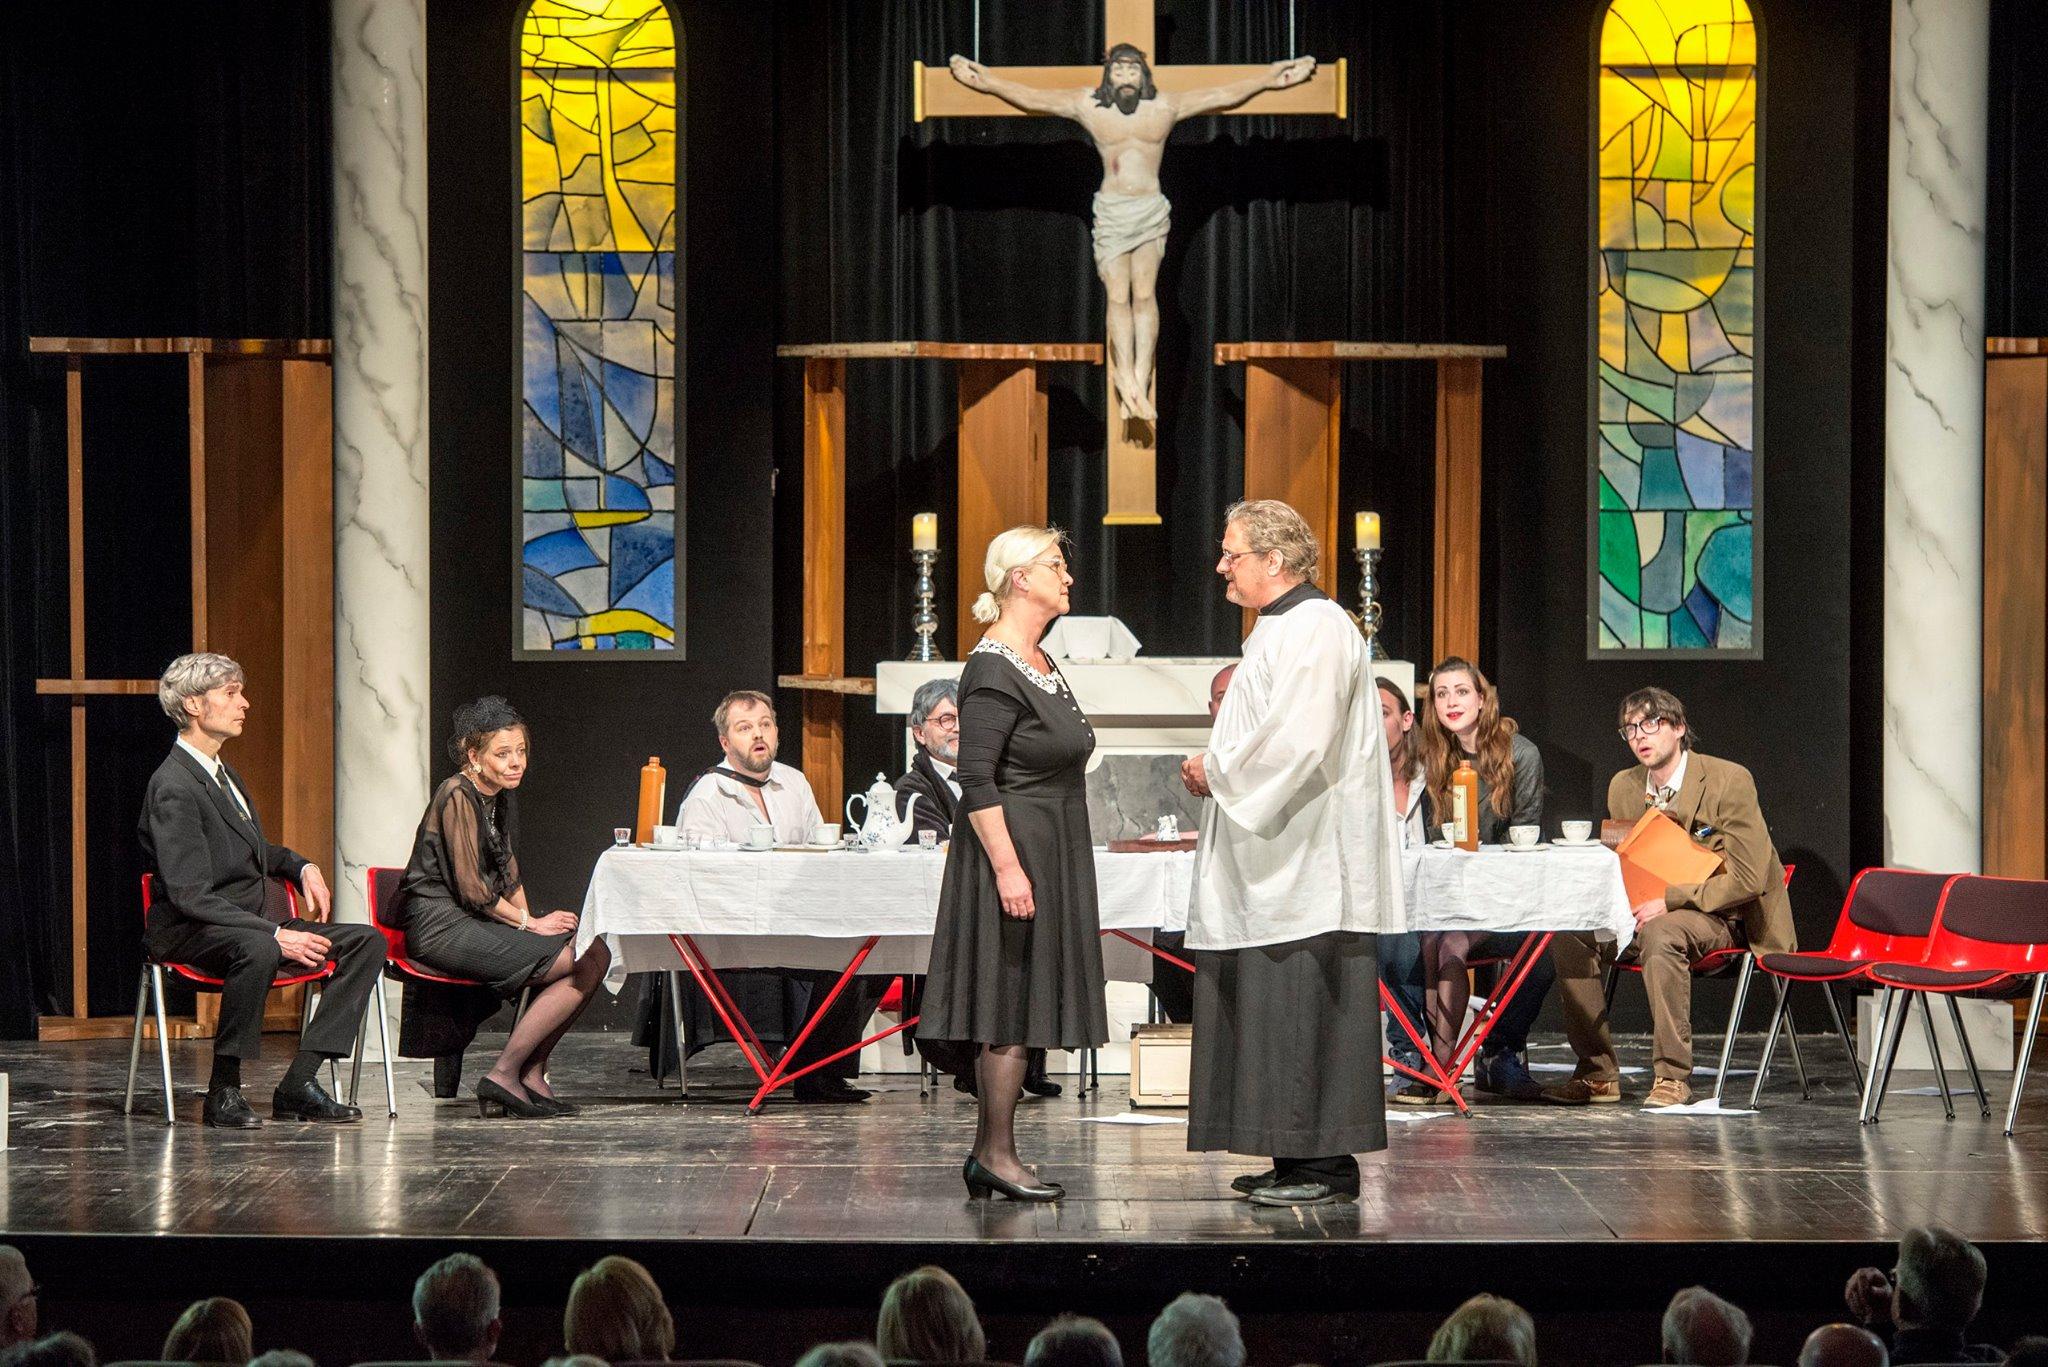 Herr Pastor & Frau Teufel